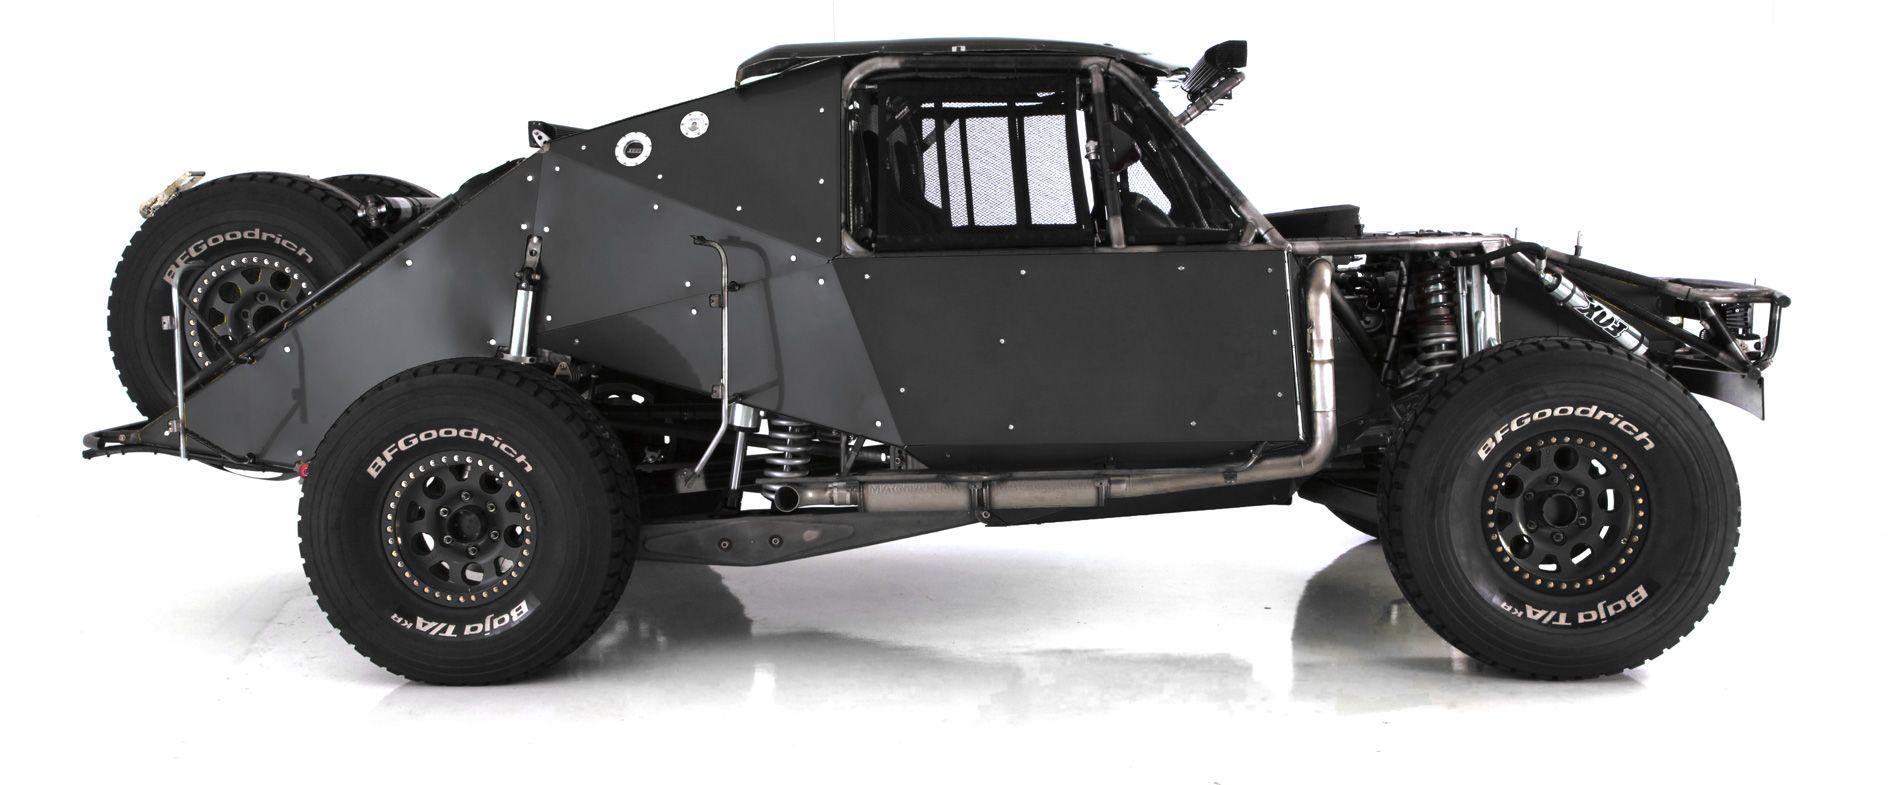 KINETIK RACE VEHICLES - Trophy Truck